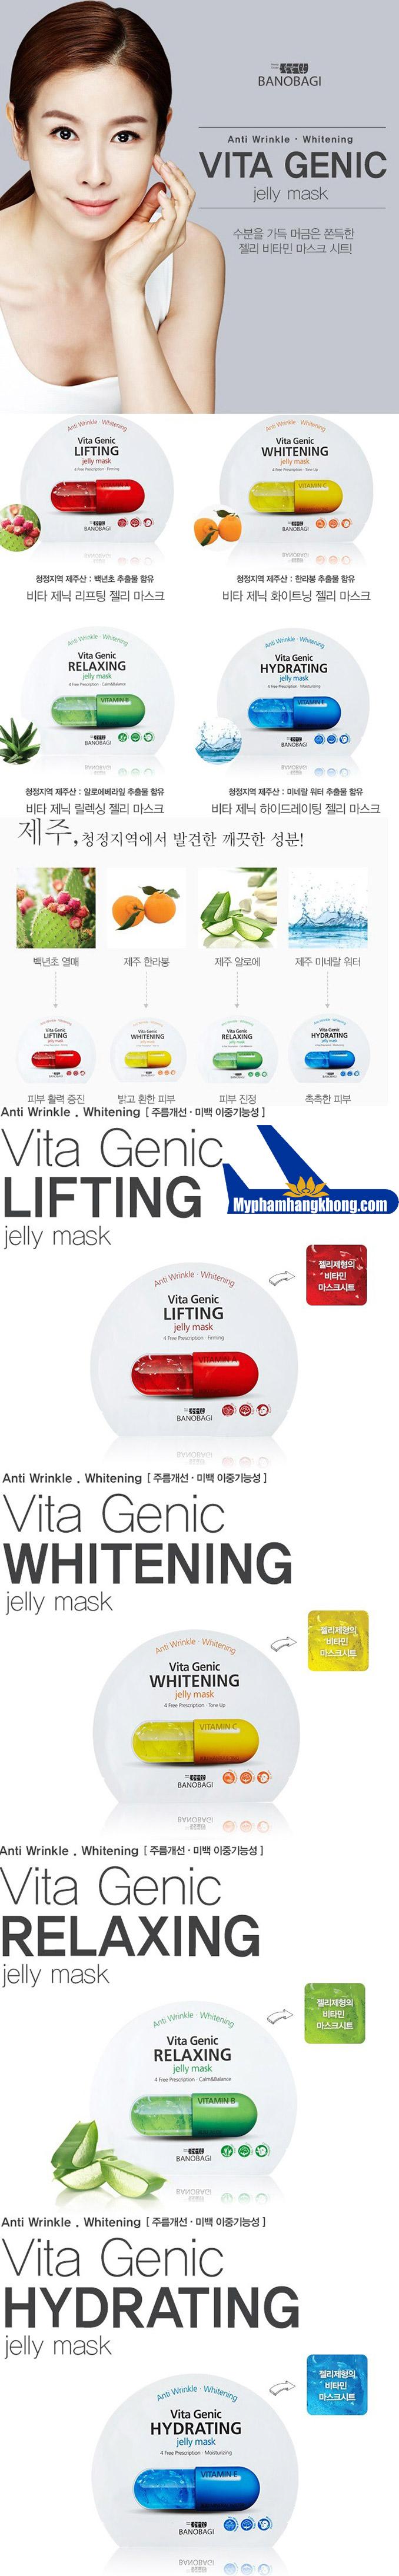 Mat-na-Banobagi-Vita-Genic-Jelly-Mask-Sheet-Han-Quoc-7